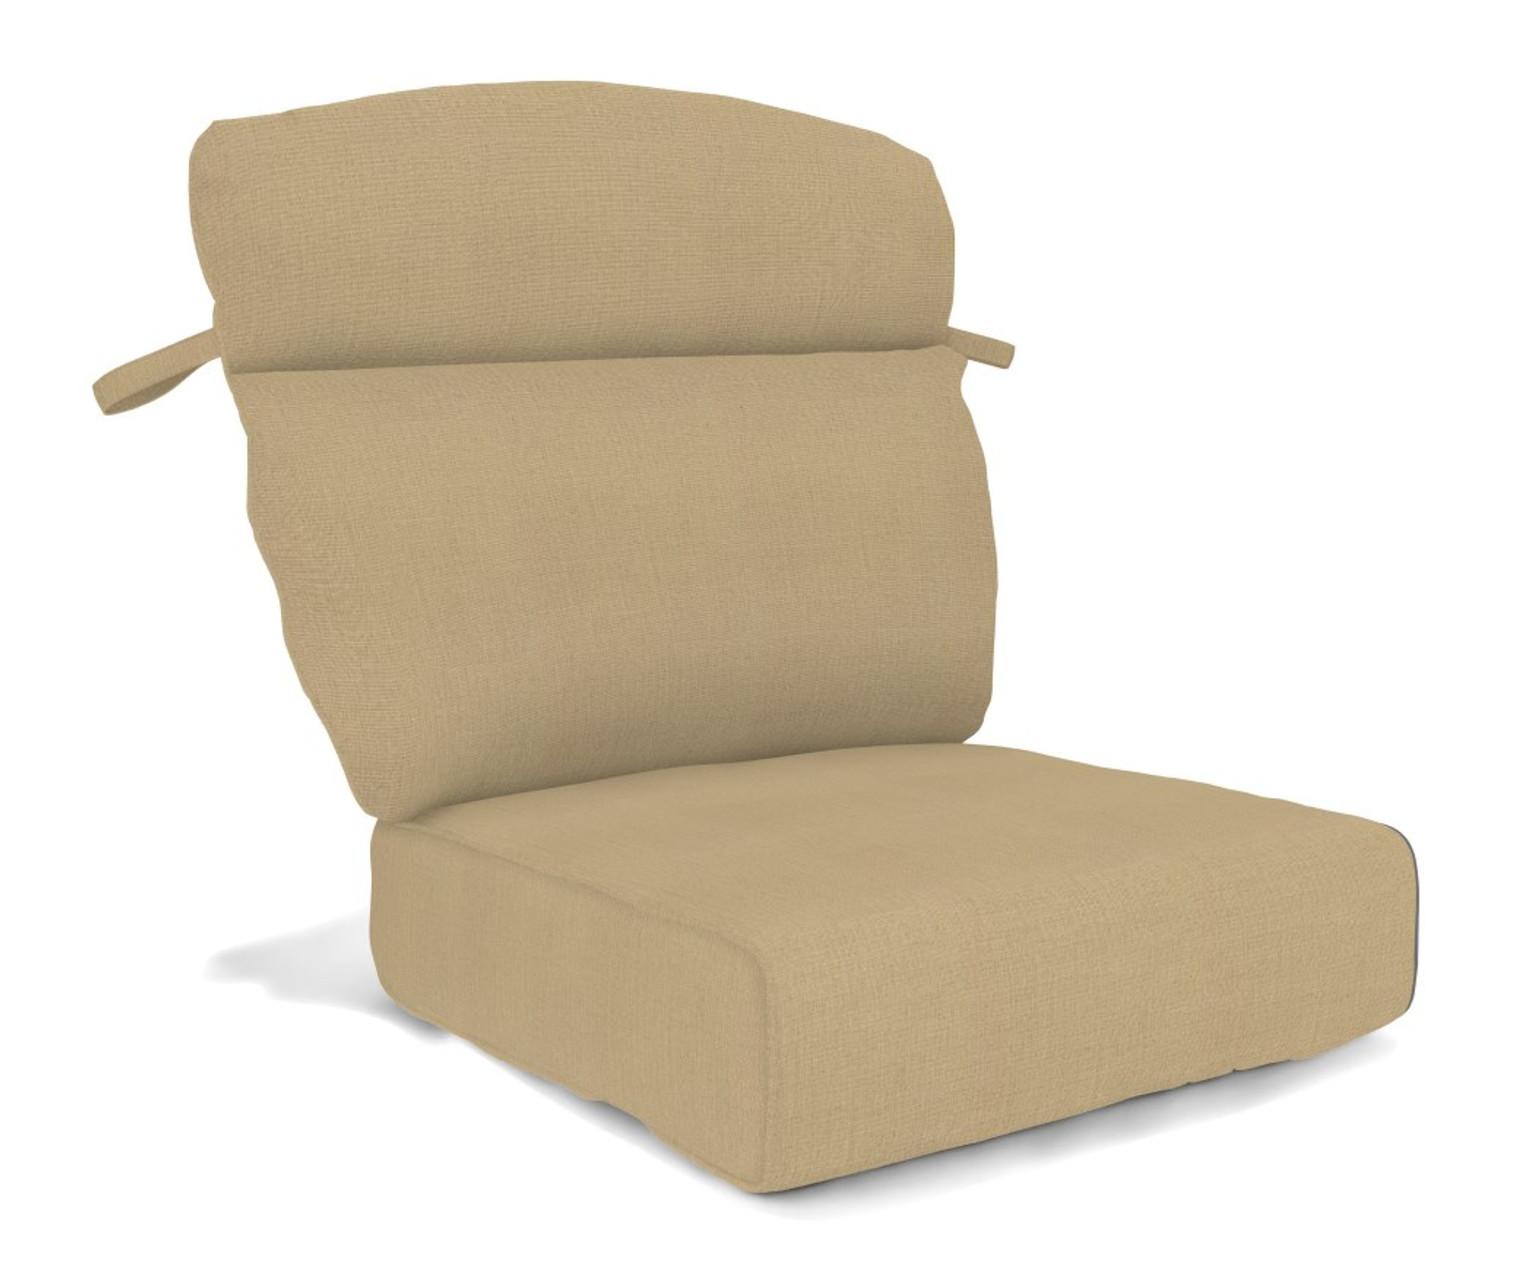 Gentil Erwin Morris Chair Cushions 6545 (Ship Time 4 6 Weeks)